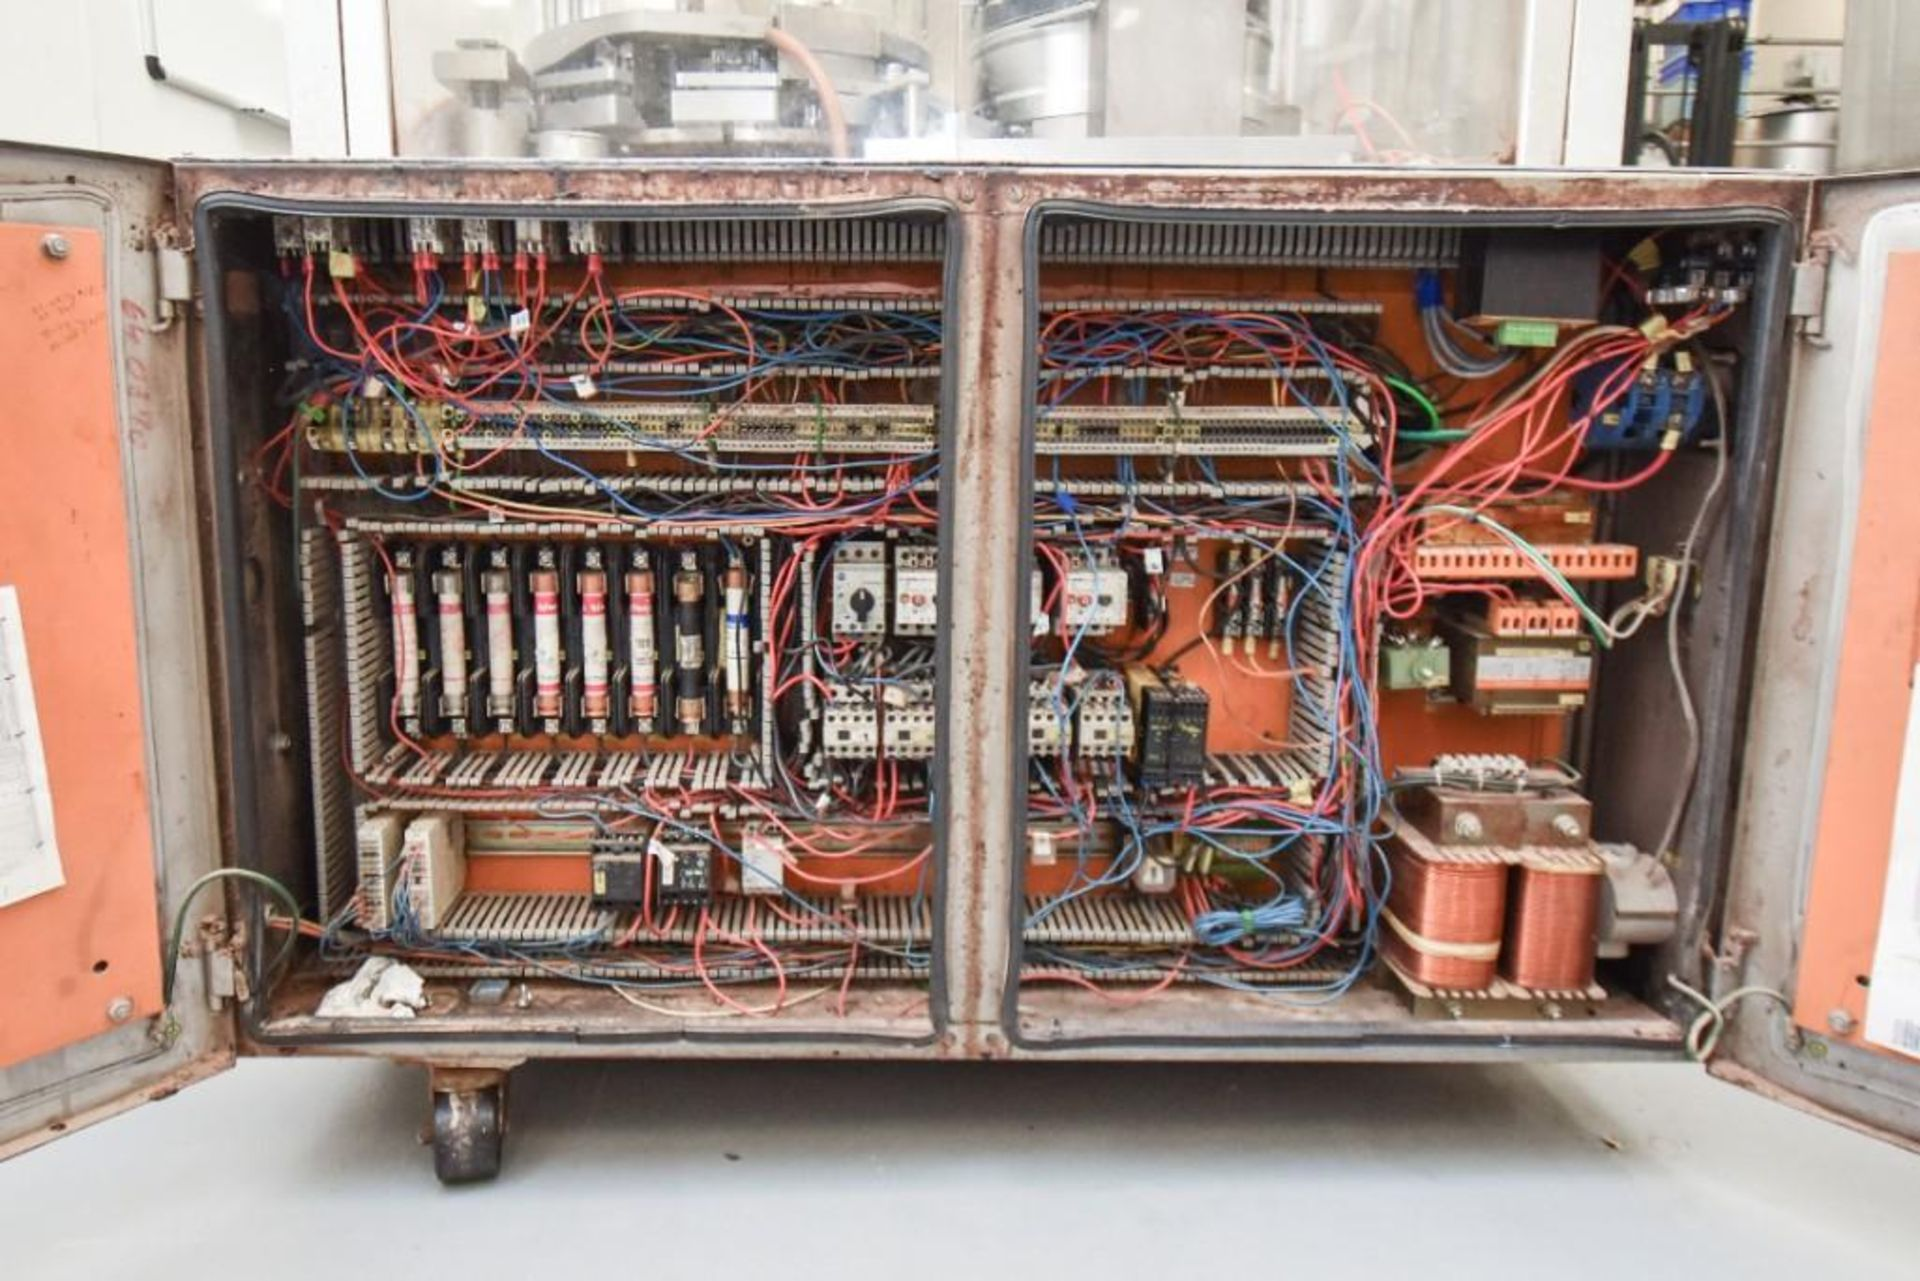 Bosch 1500 Encapsulation Machine - Image 6 of 11